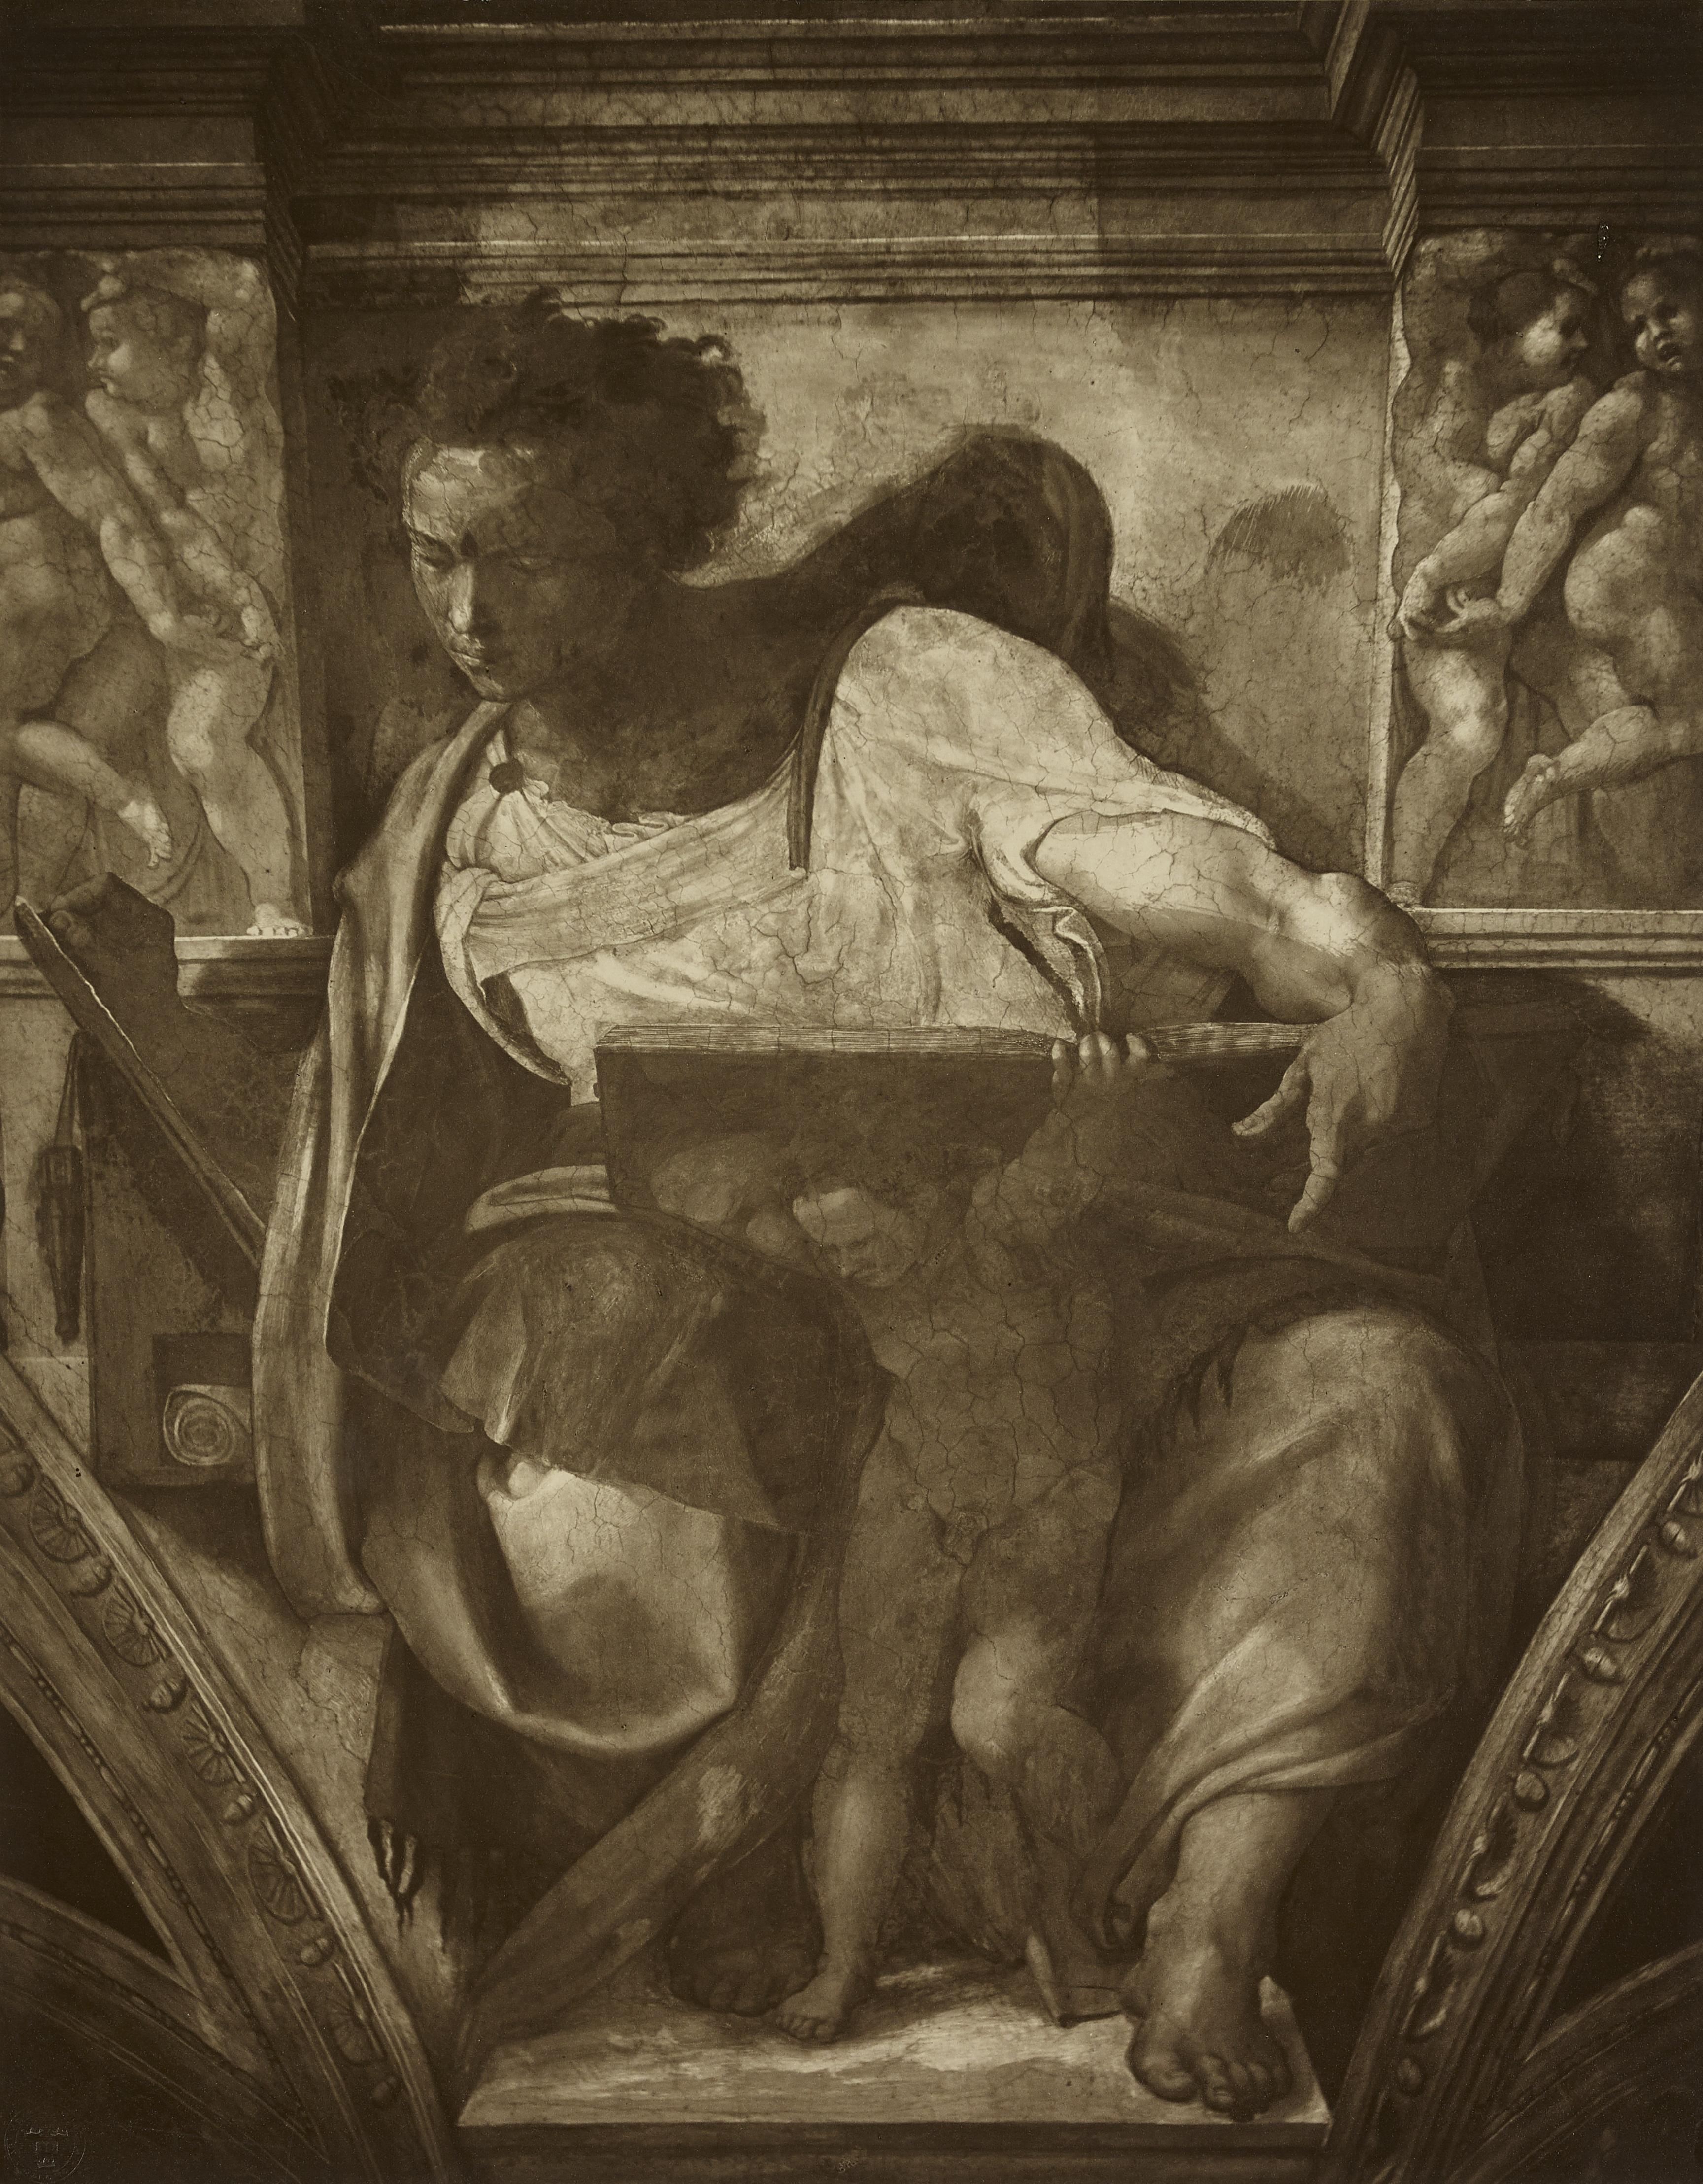 Adolph Braun black and white photograph of the Sistine Chapel fresco showing Prophet Daniel